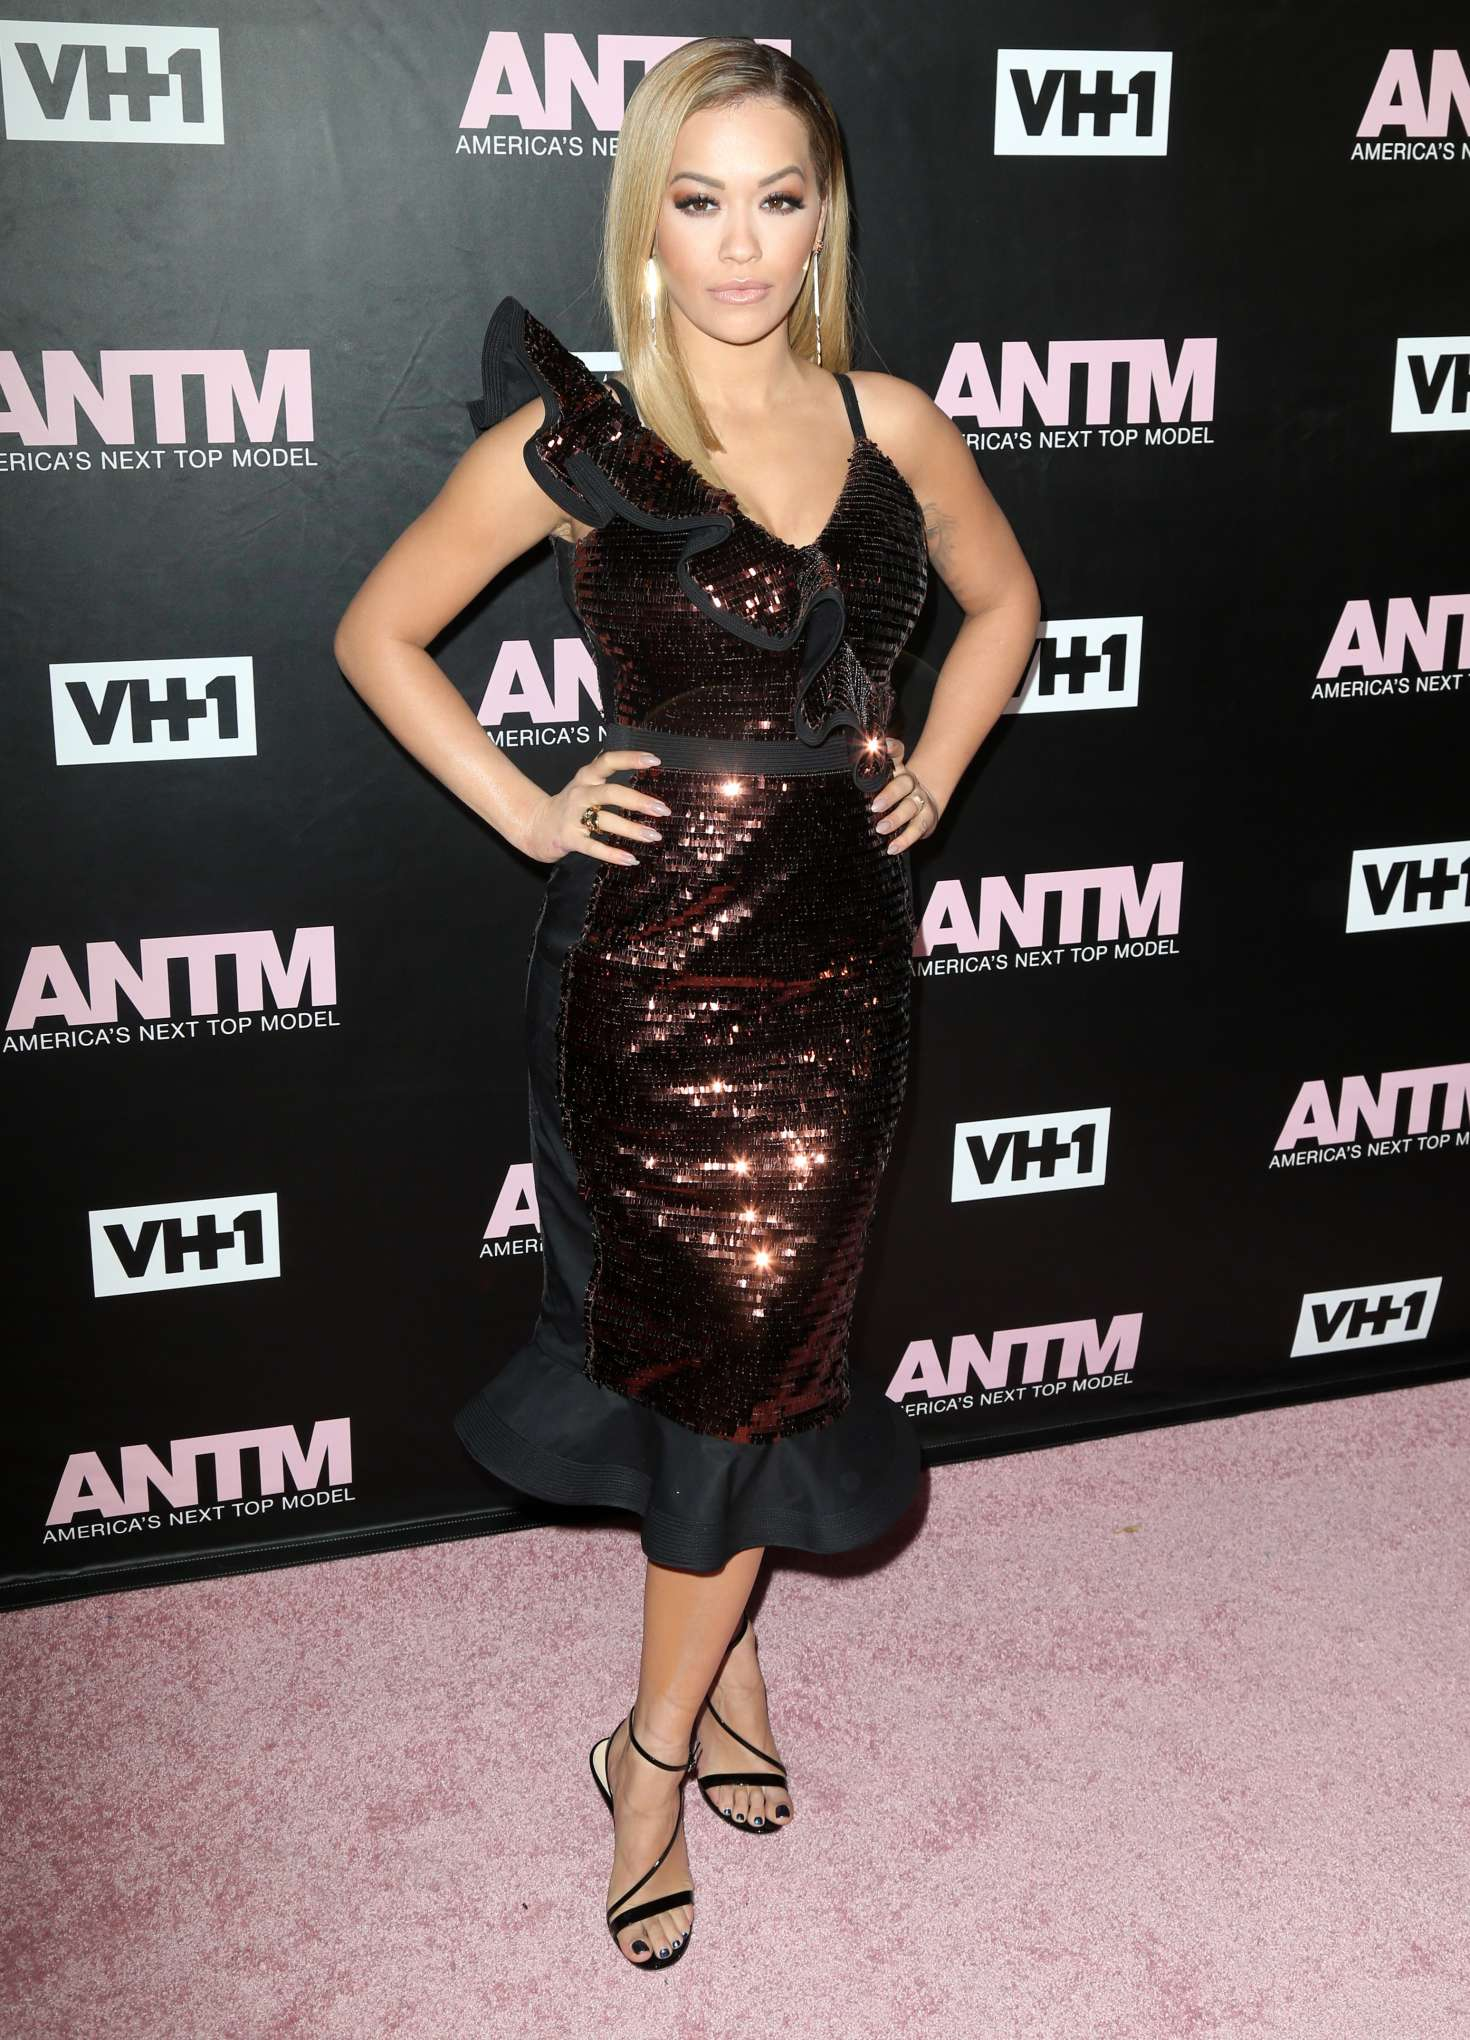 Rita Ora 2016 : Rita Ora: Americas Next Top Model Premiere Party -32